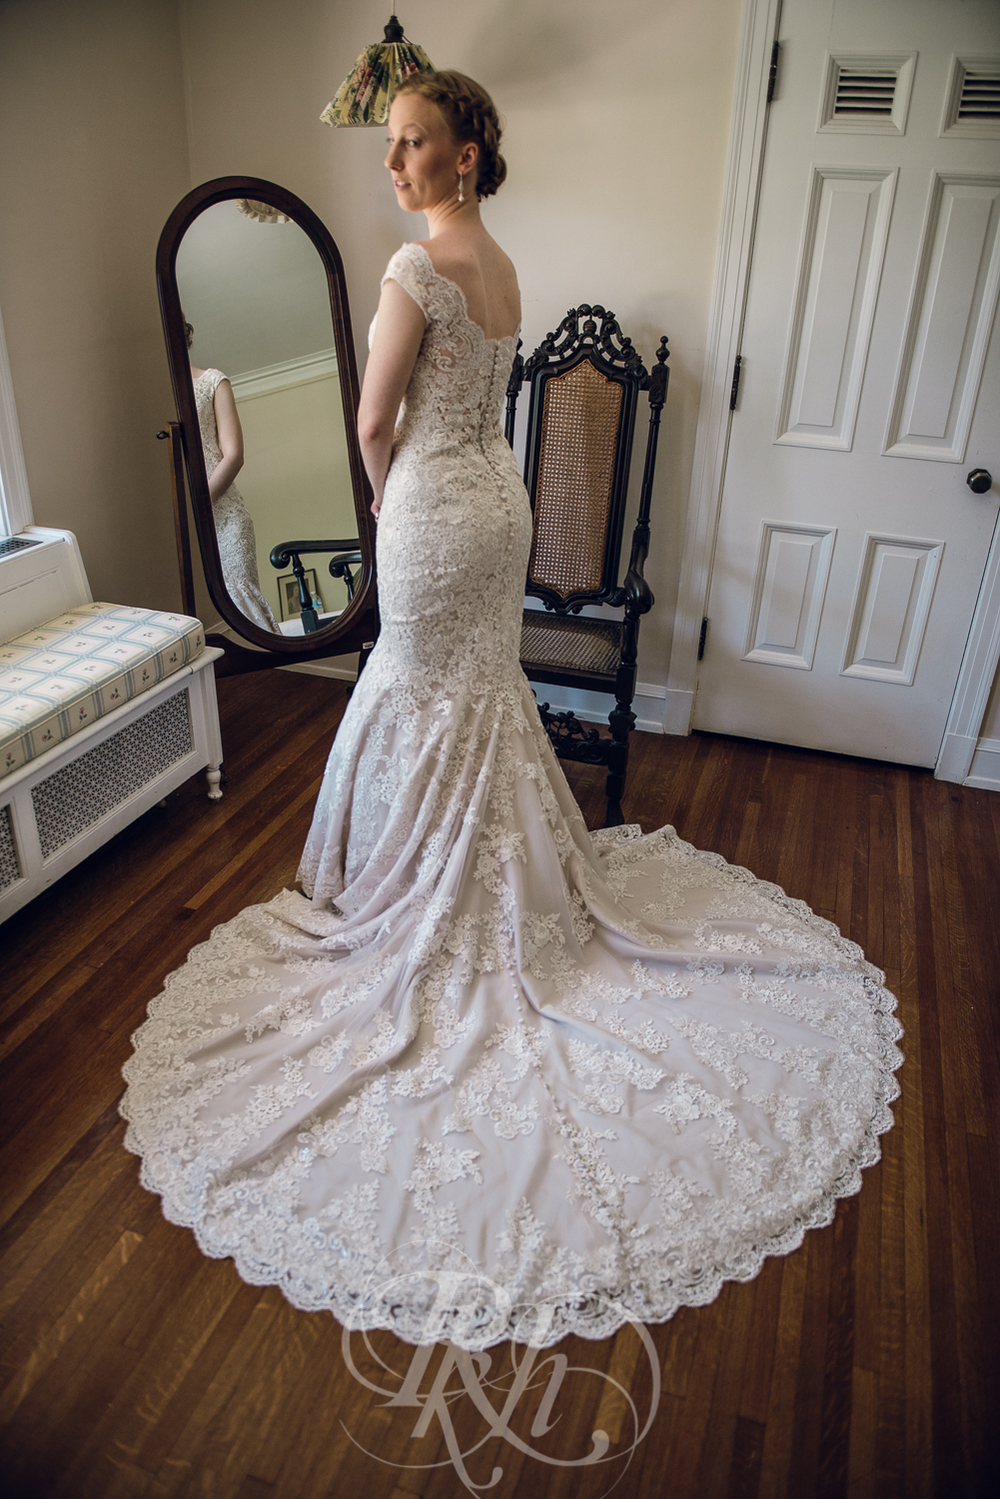 Erin & Jared - Minnesota Wedding Photographer - RKH Images - Blog - Getting Ready-11.jpg